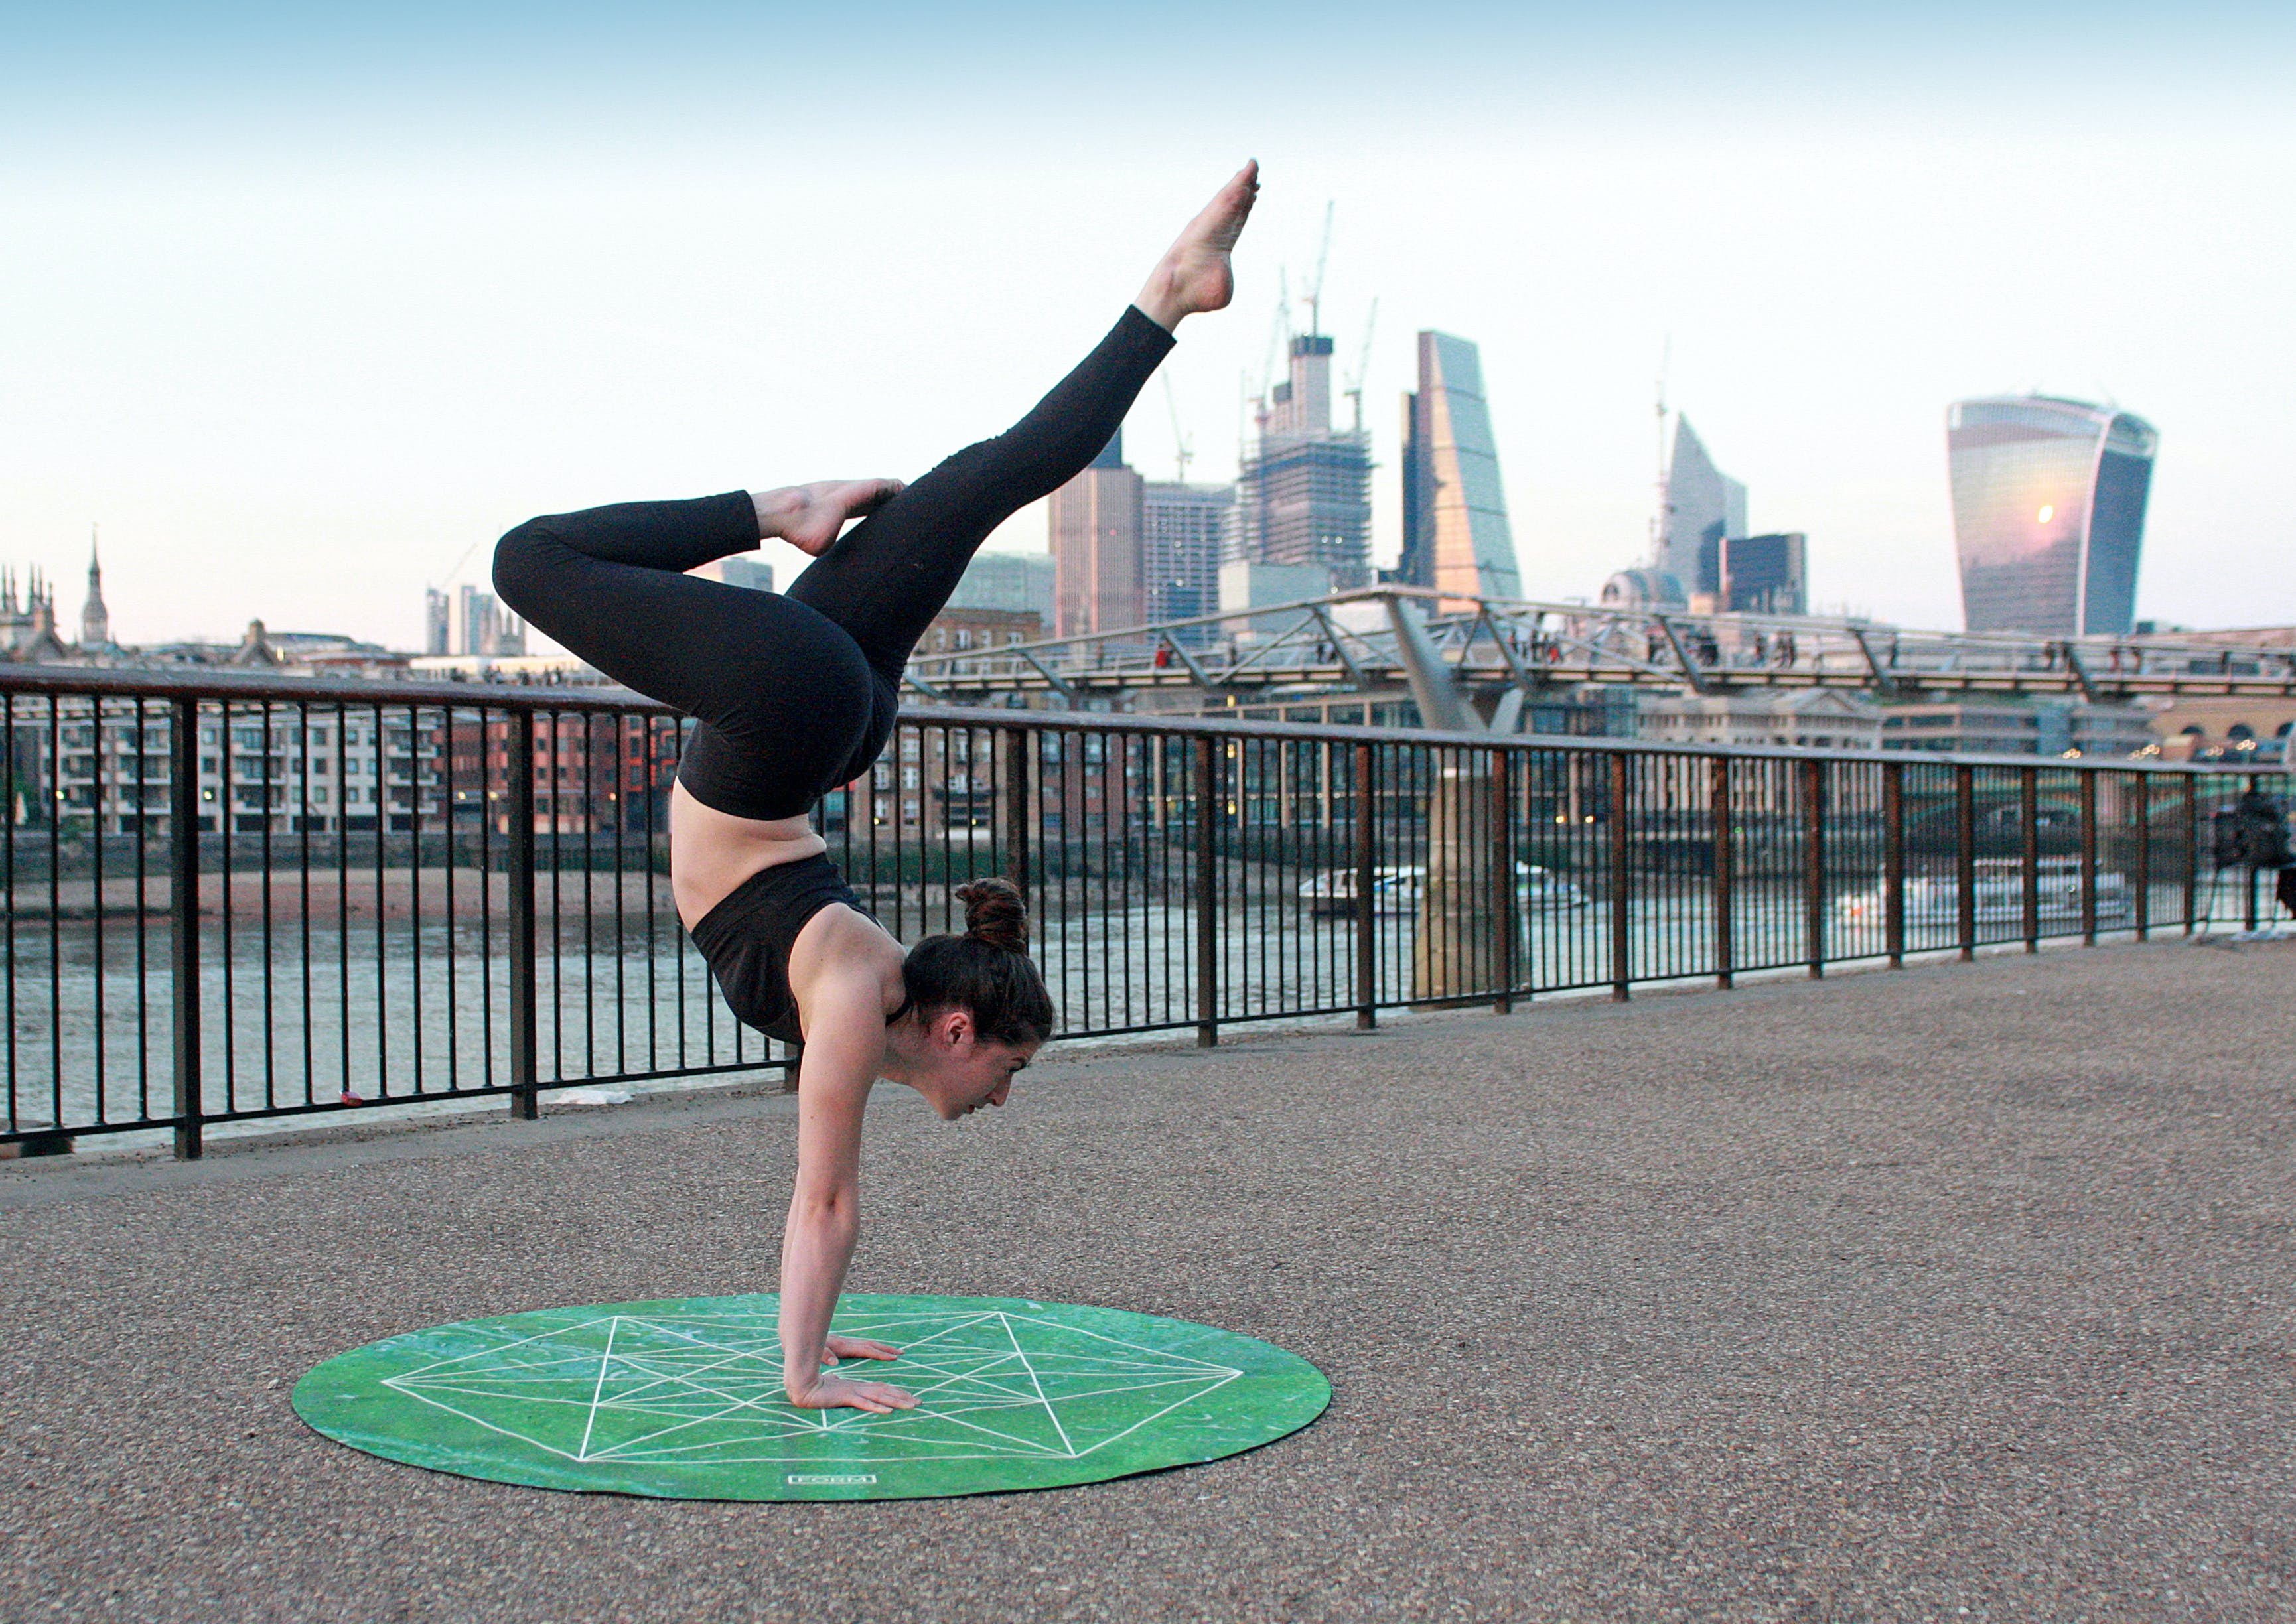 Woman Wearing Black Top And Leggings On Green Yoga Mat